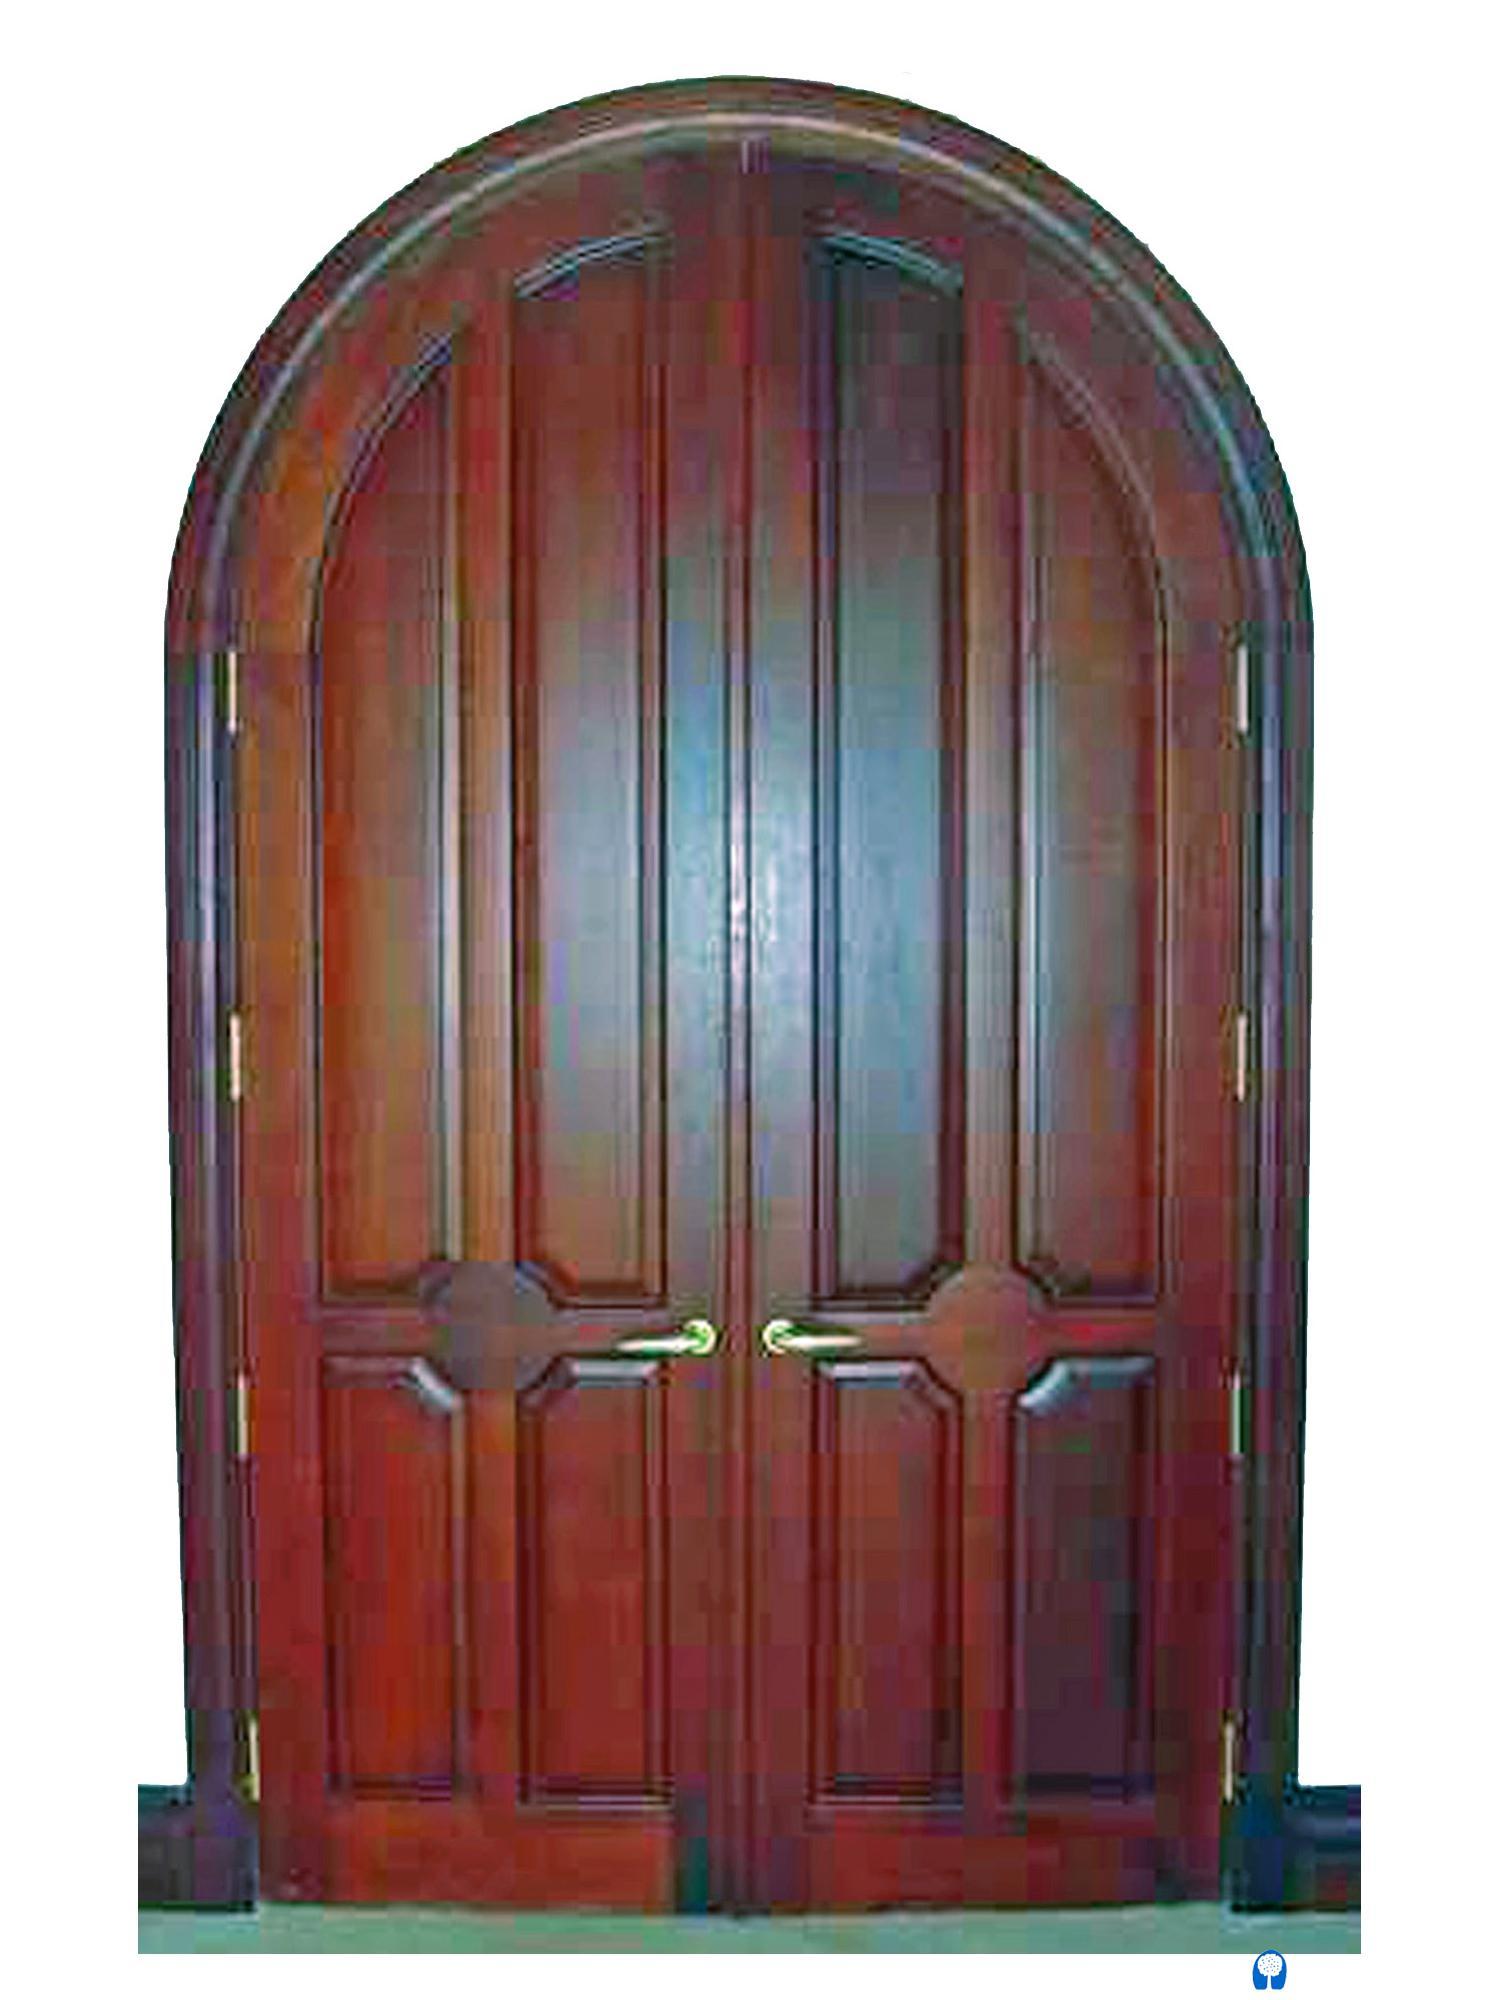 BAL HARBOUR MAHOGANY ARCH DOOR.  sc 1 st  Sabana Windows & BAL HARBOUR MAHOGANY ARCH DOOR. - Sabana Windows